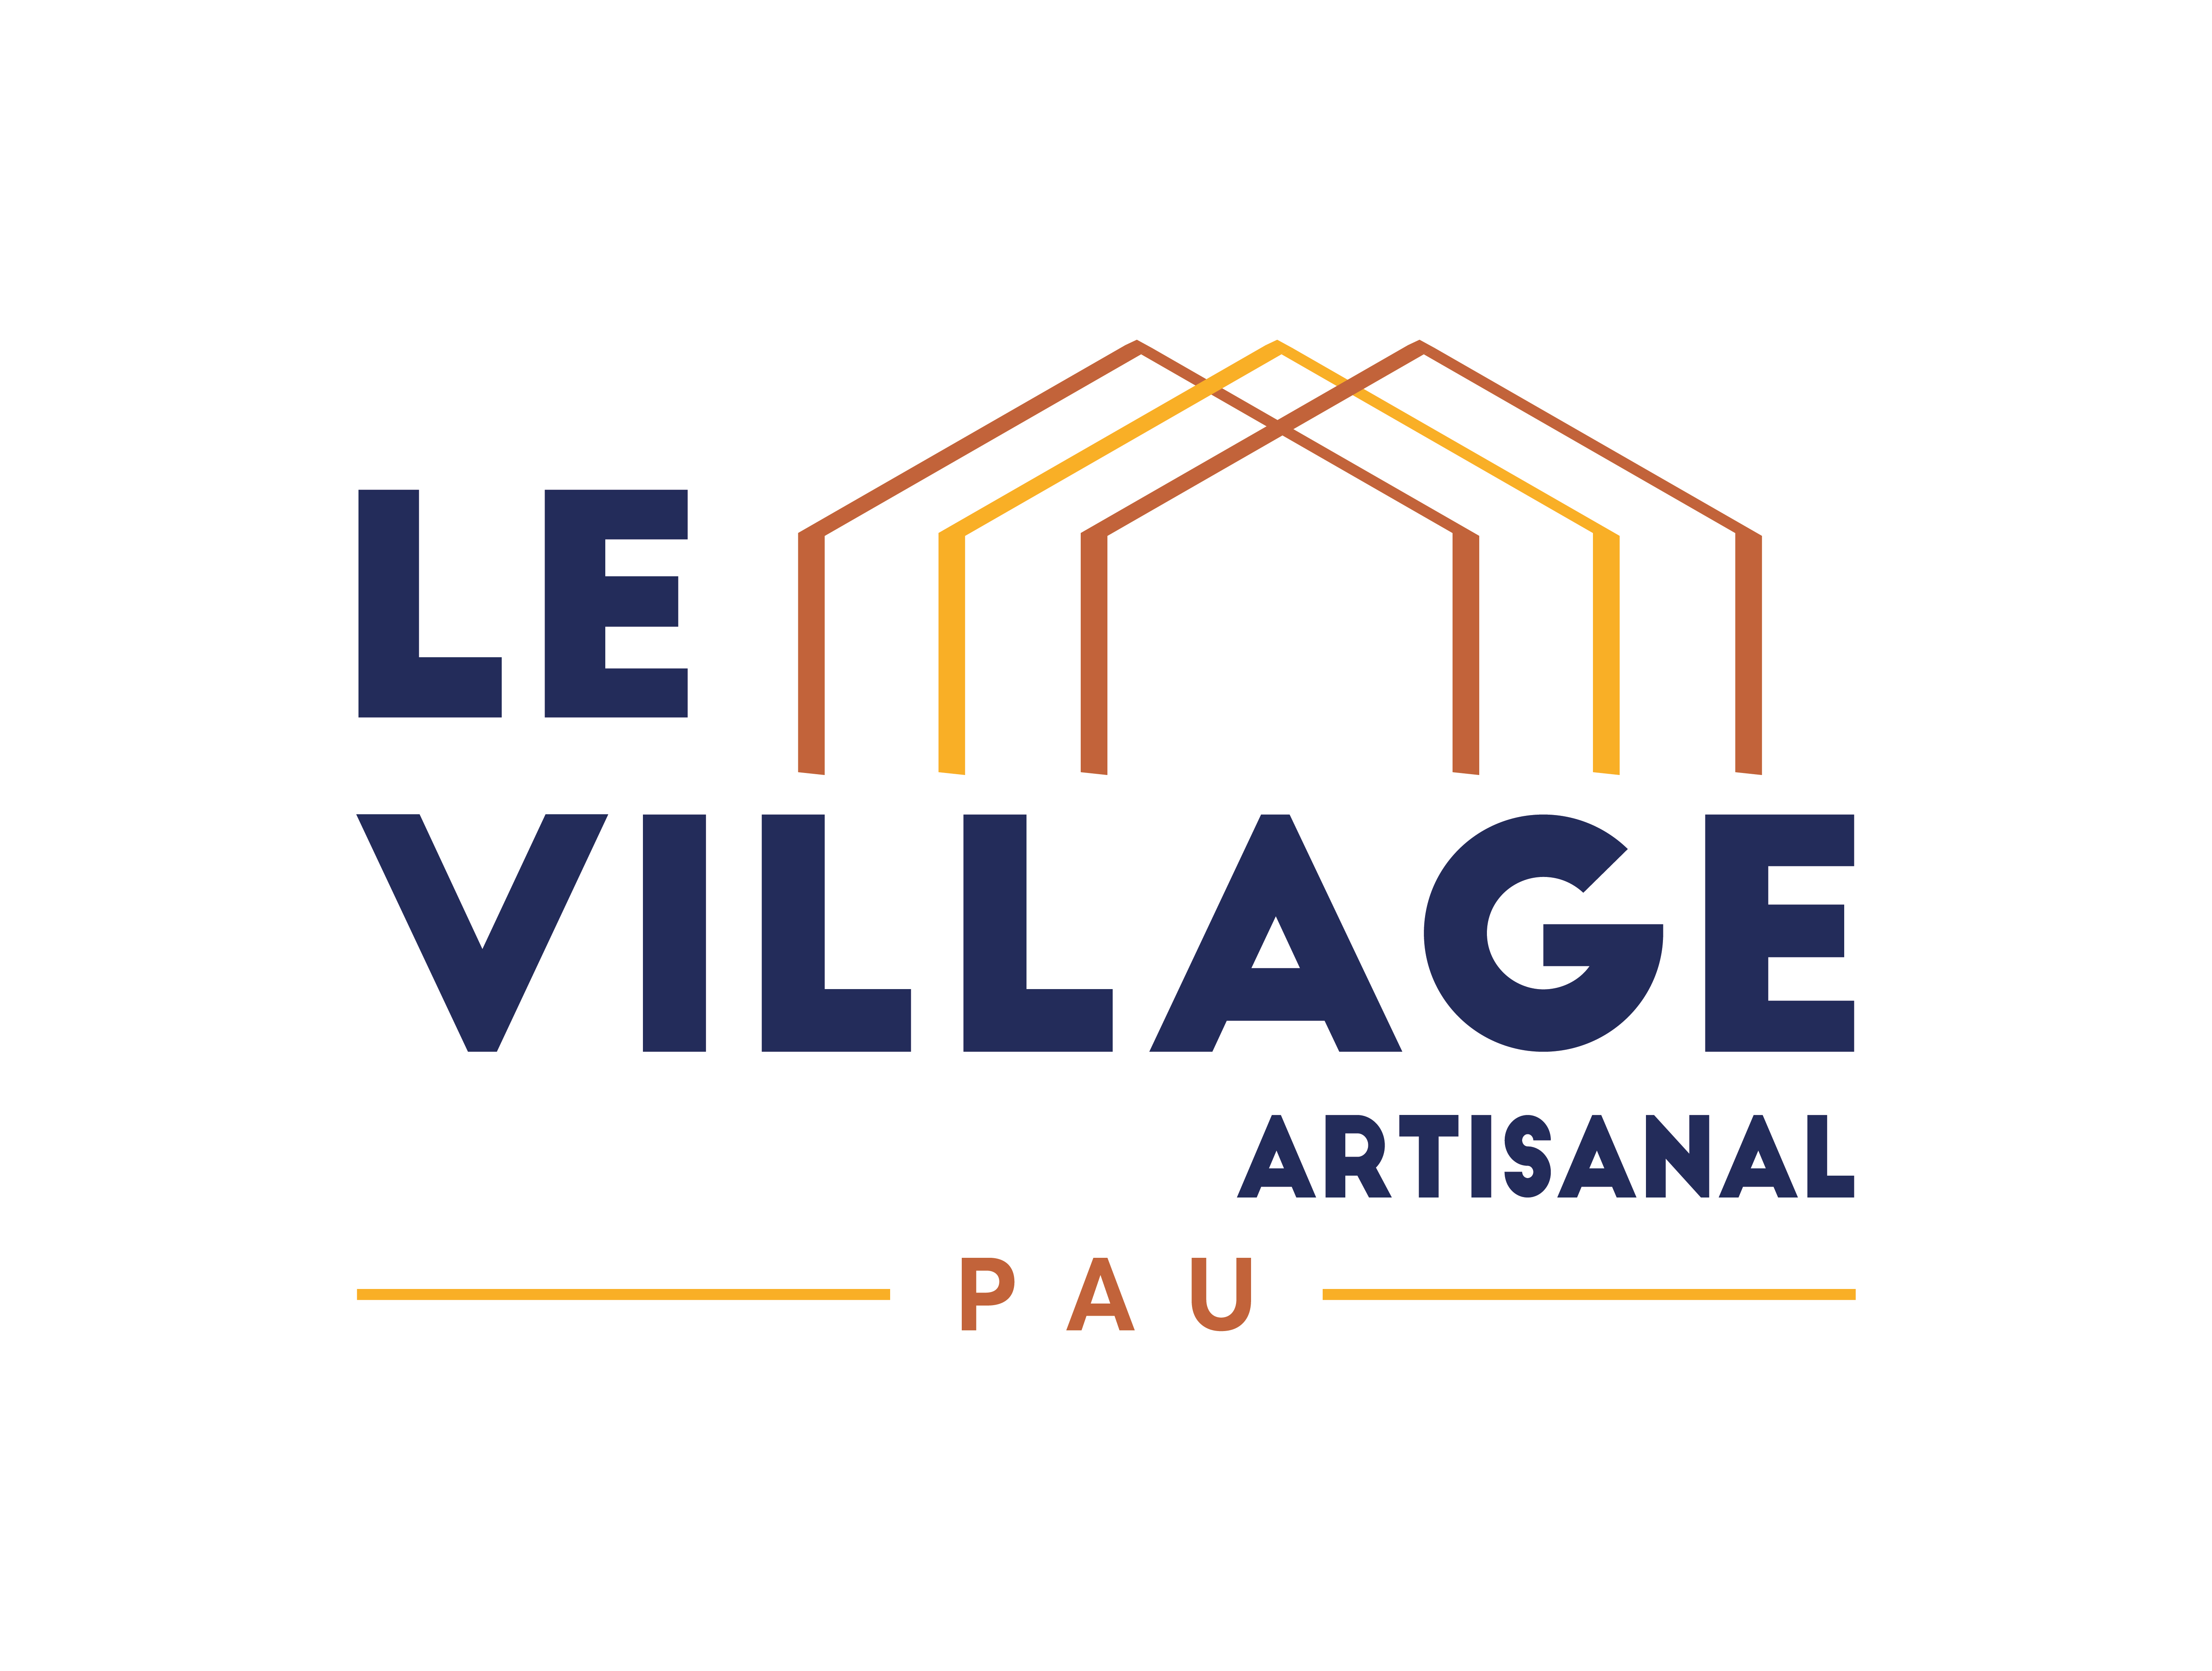 Village Artisanal Pau